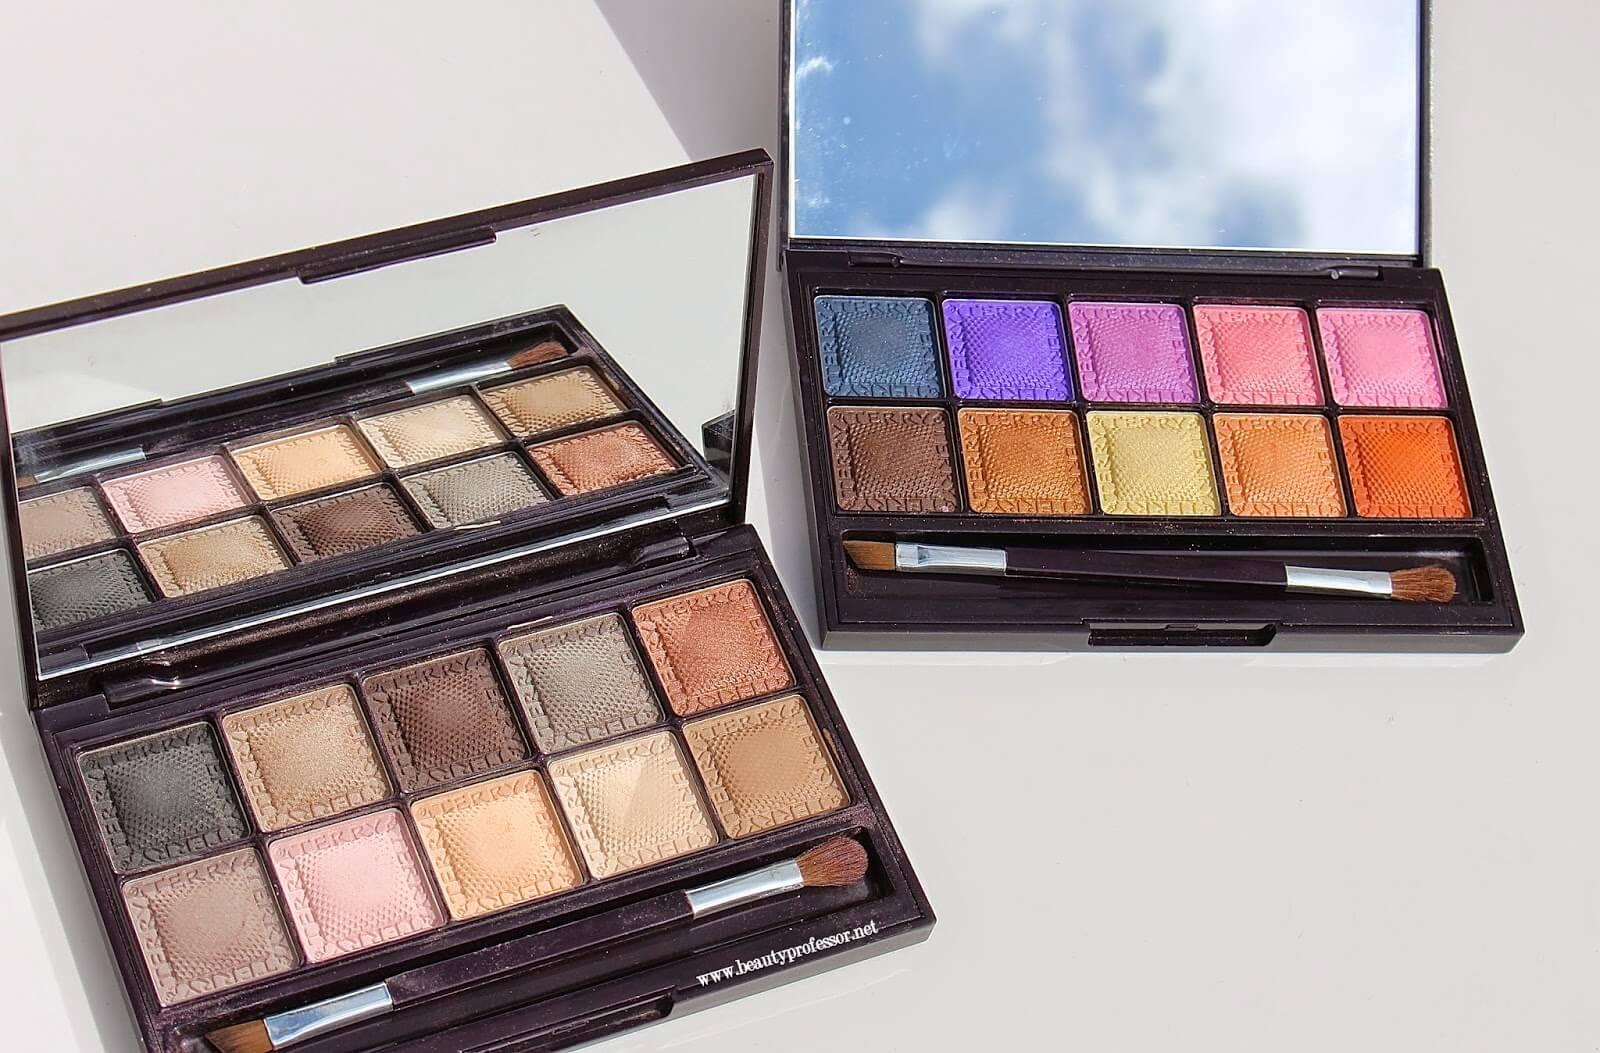 14 best eyeshadow palettes to enhance your beauty live enhanced. Black Bedroom Furniture Sets. Home Design Ideas